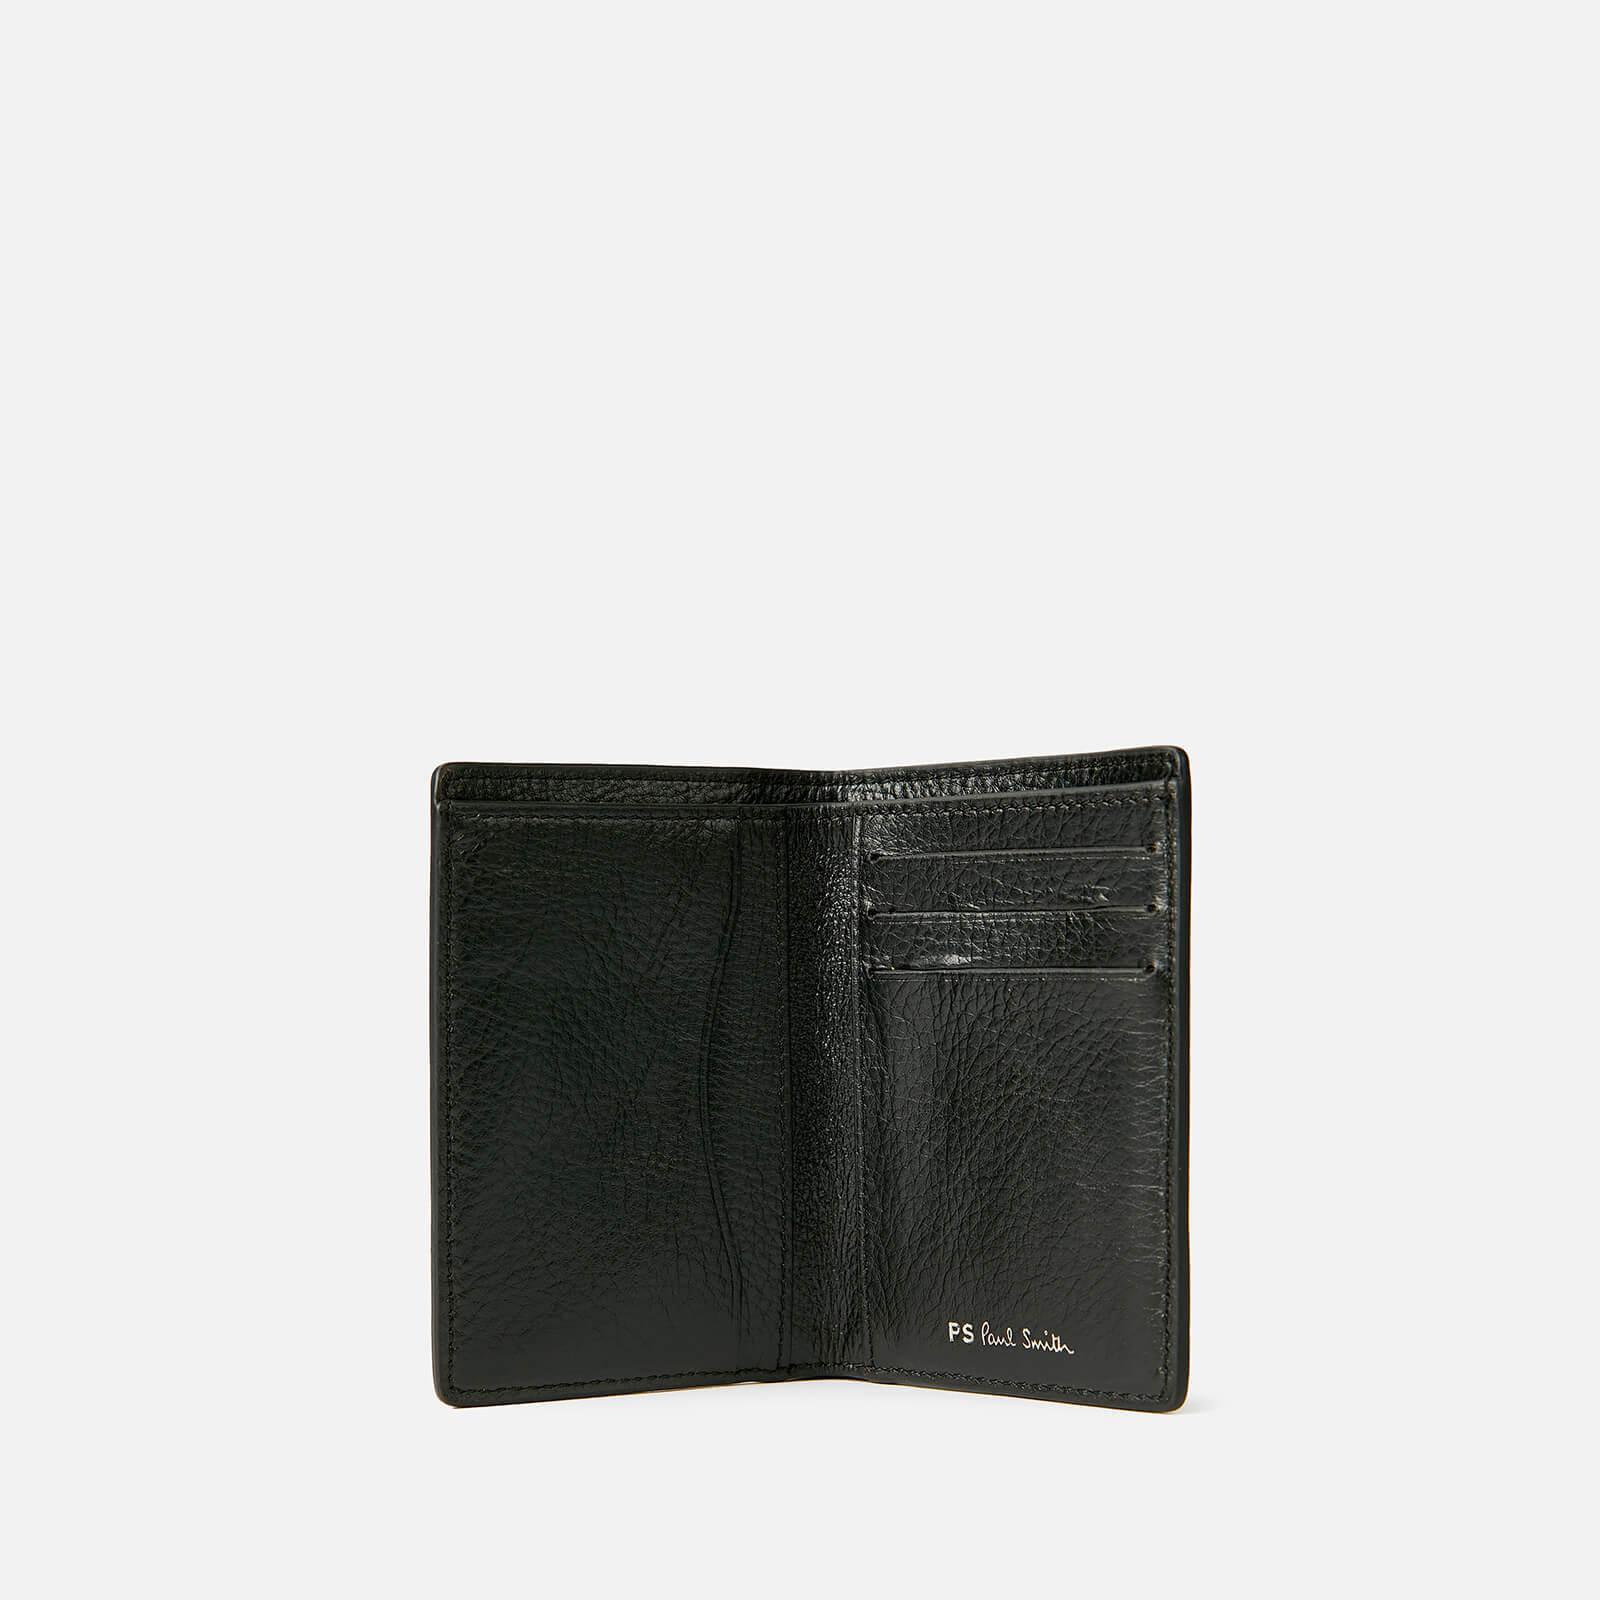 ps paul smith men's stripe credit card wallet - black